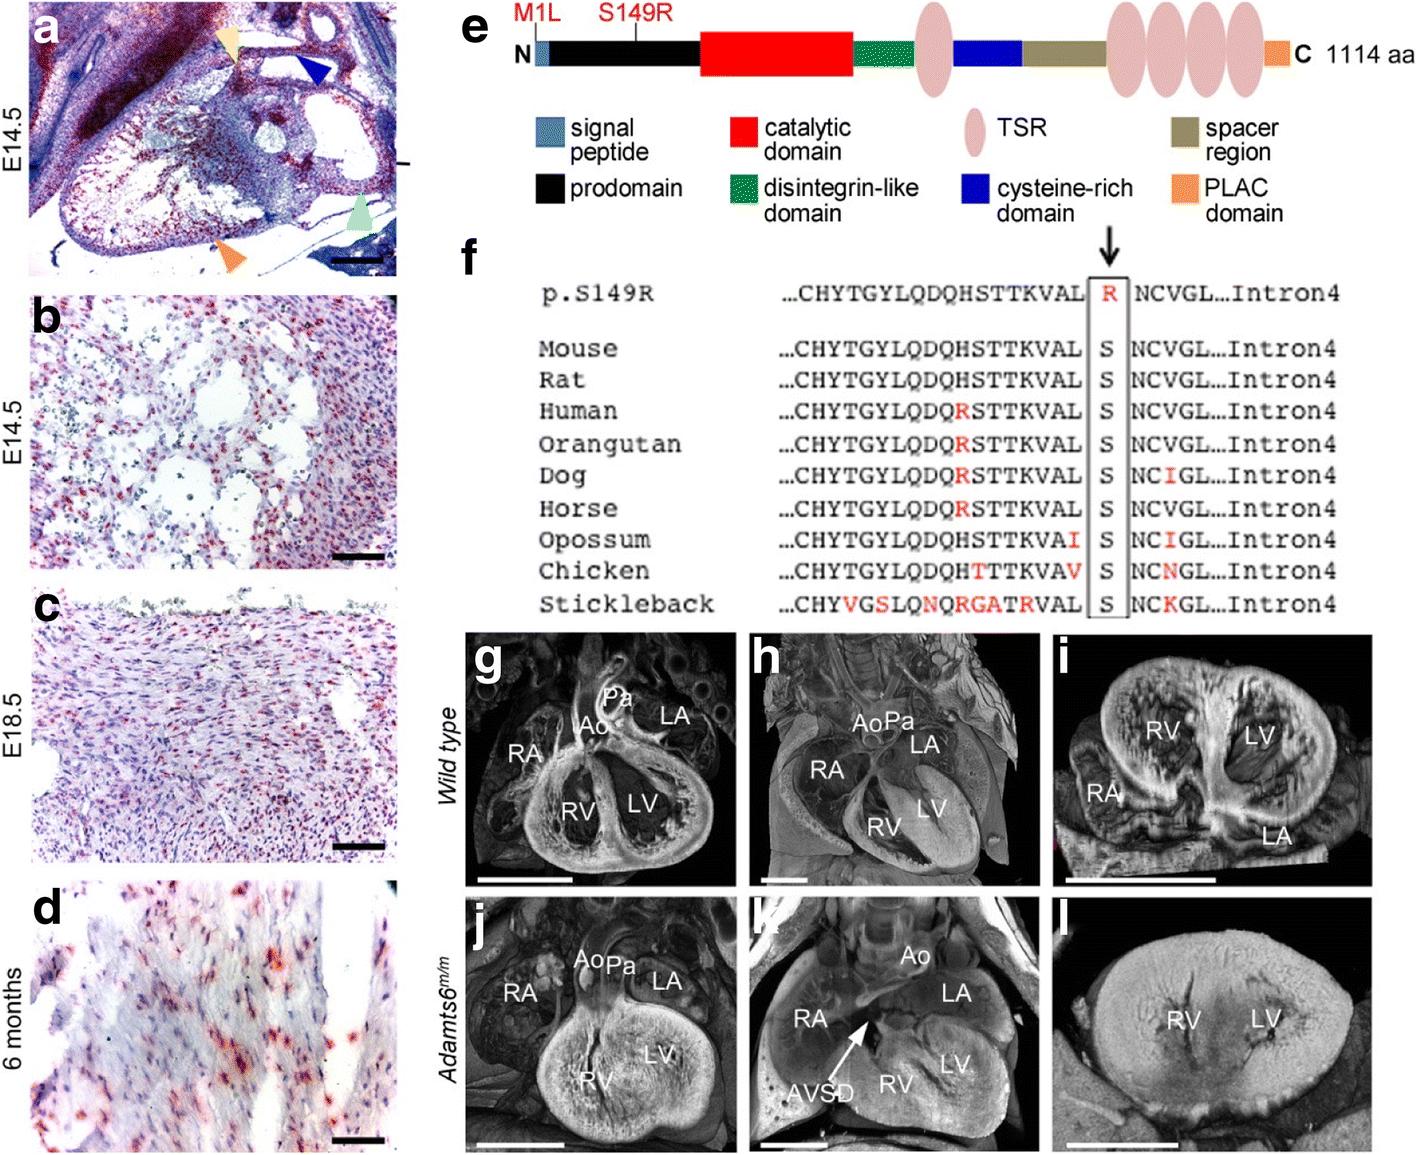 Exome-chip meta-analysis identifies novel loci associated